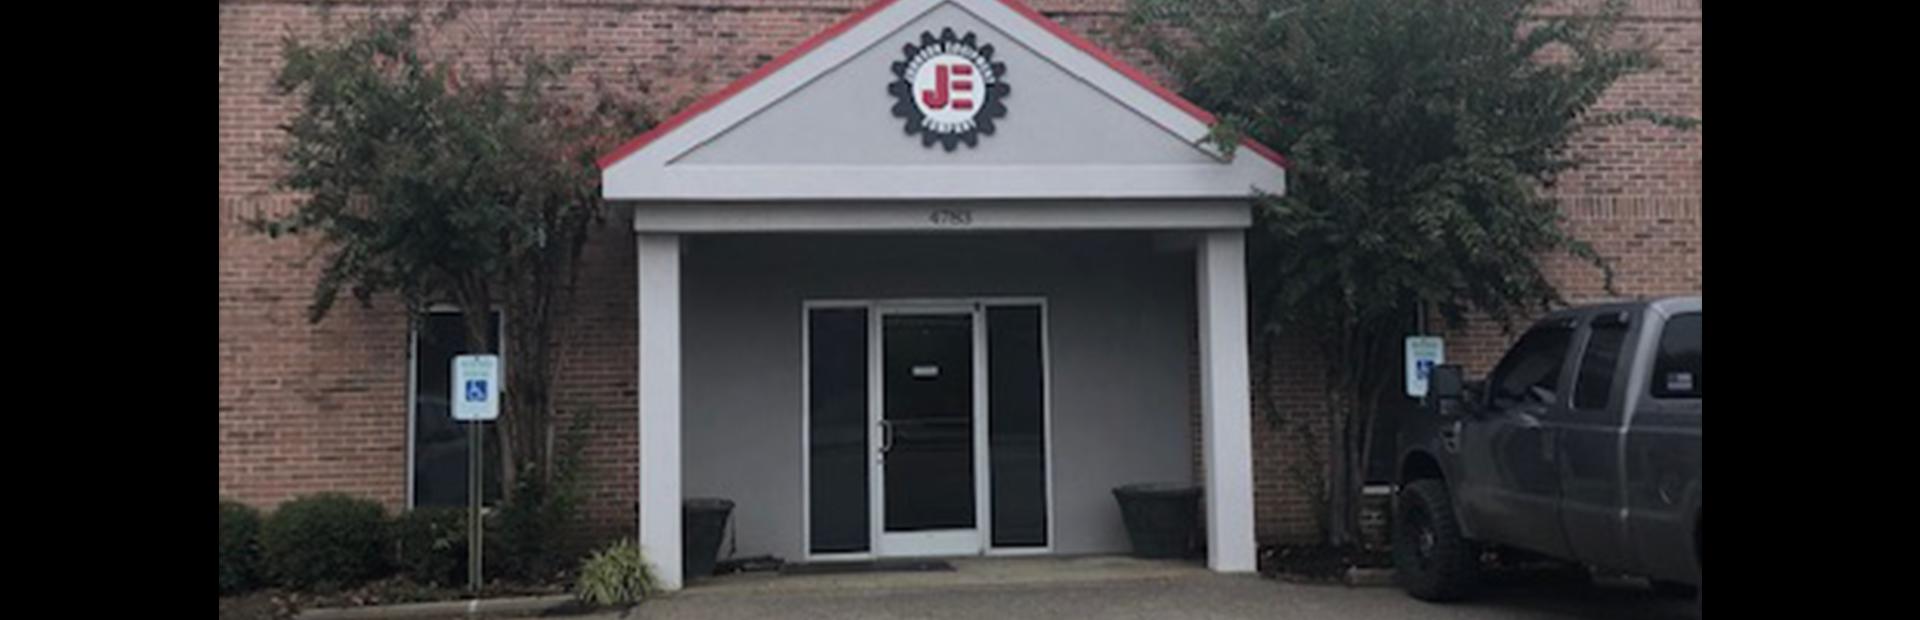 Johnson Equipment Company - Memphis, Tennessee